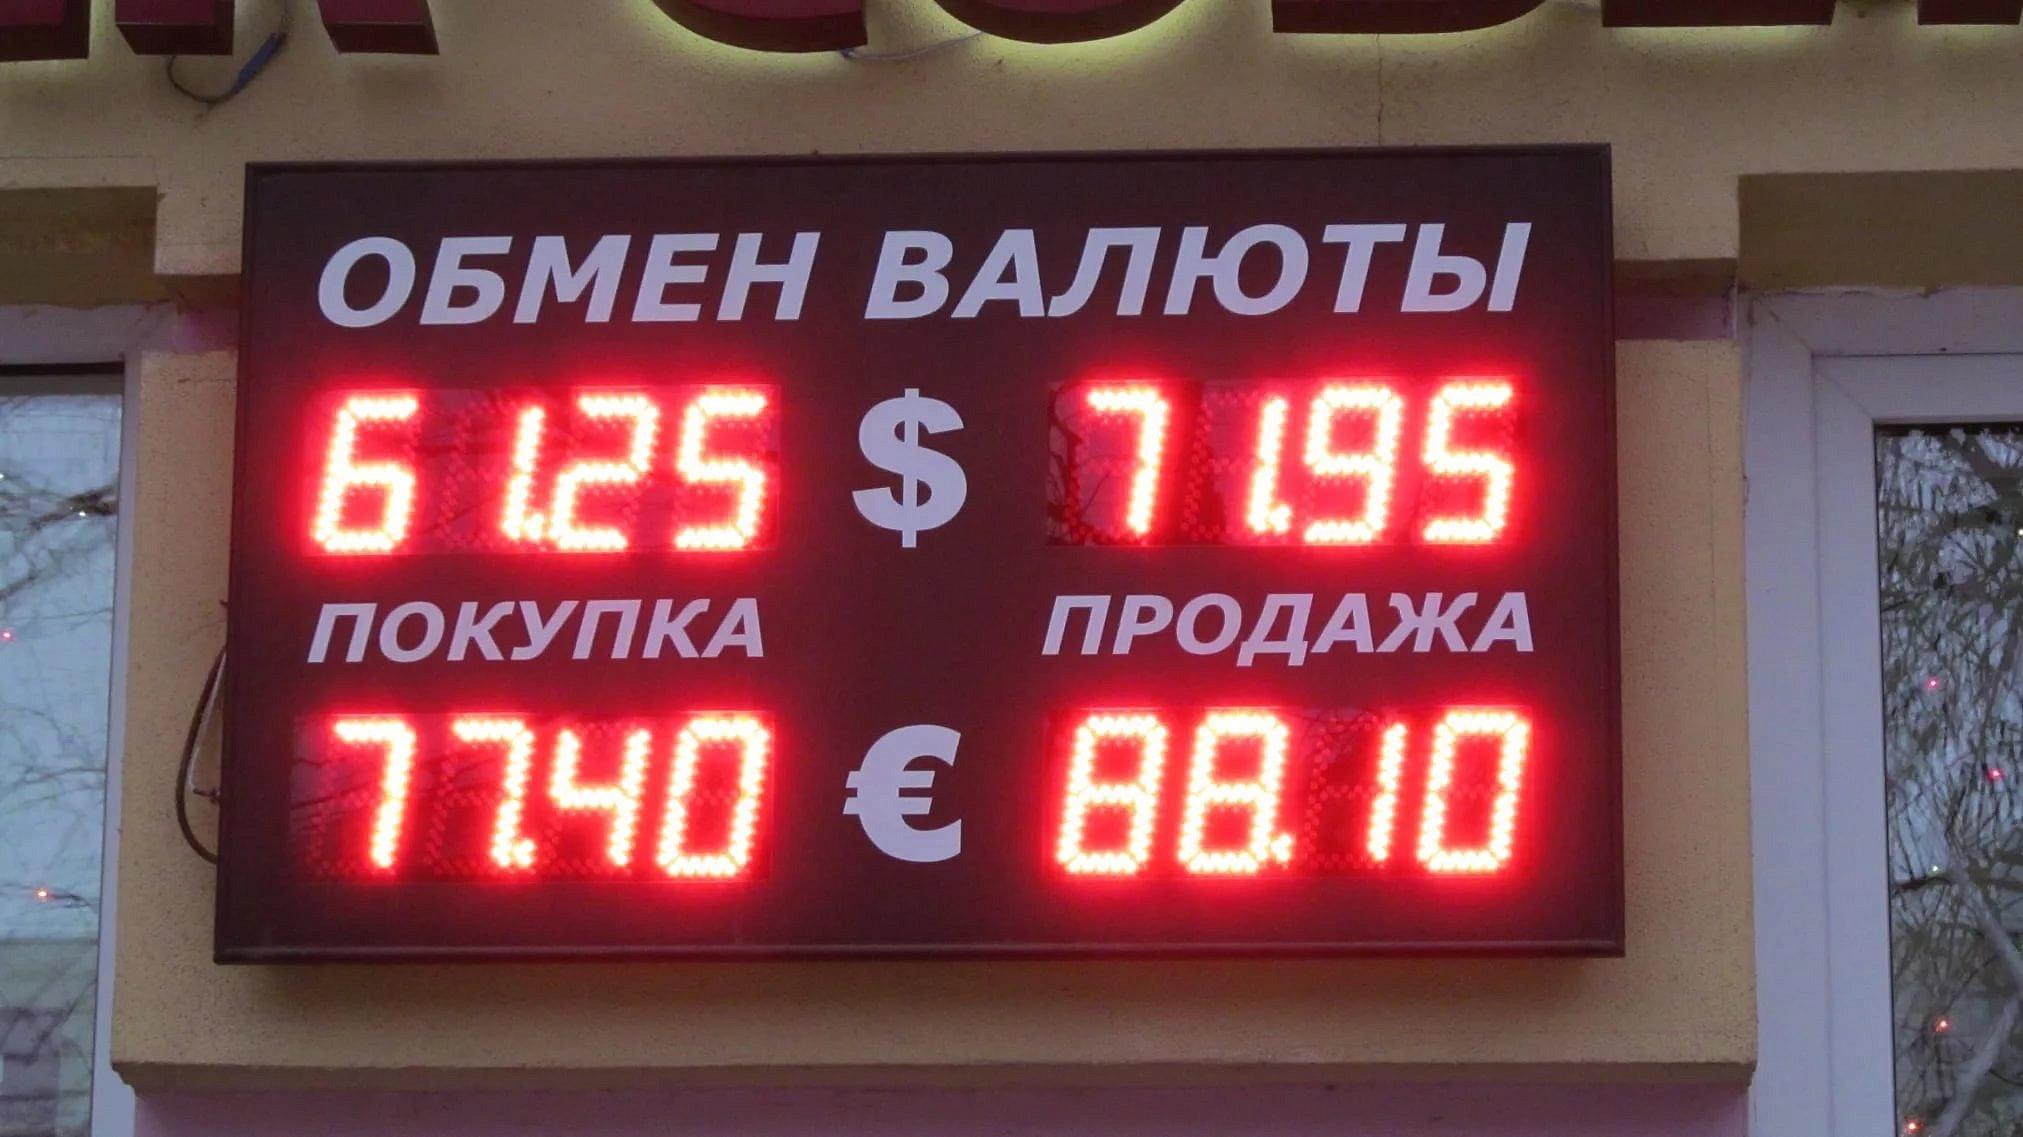 ароматы, как курс валюты в банках зеленограда выбирая